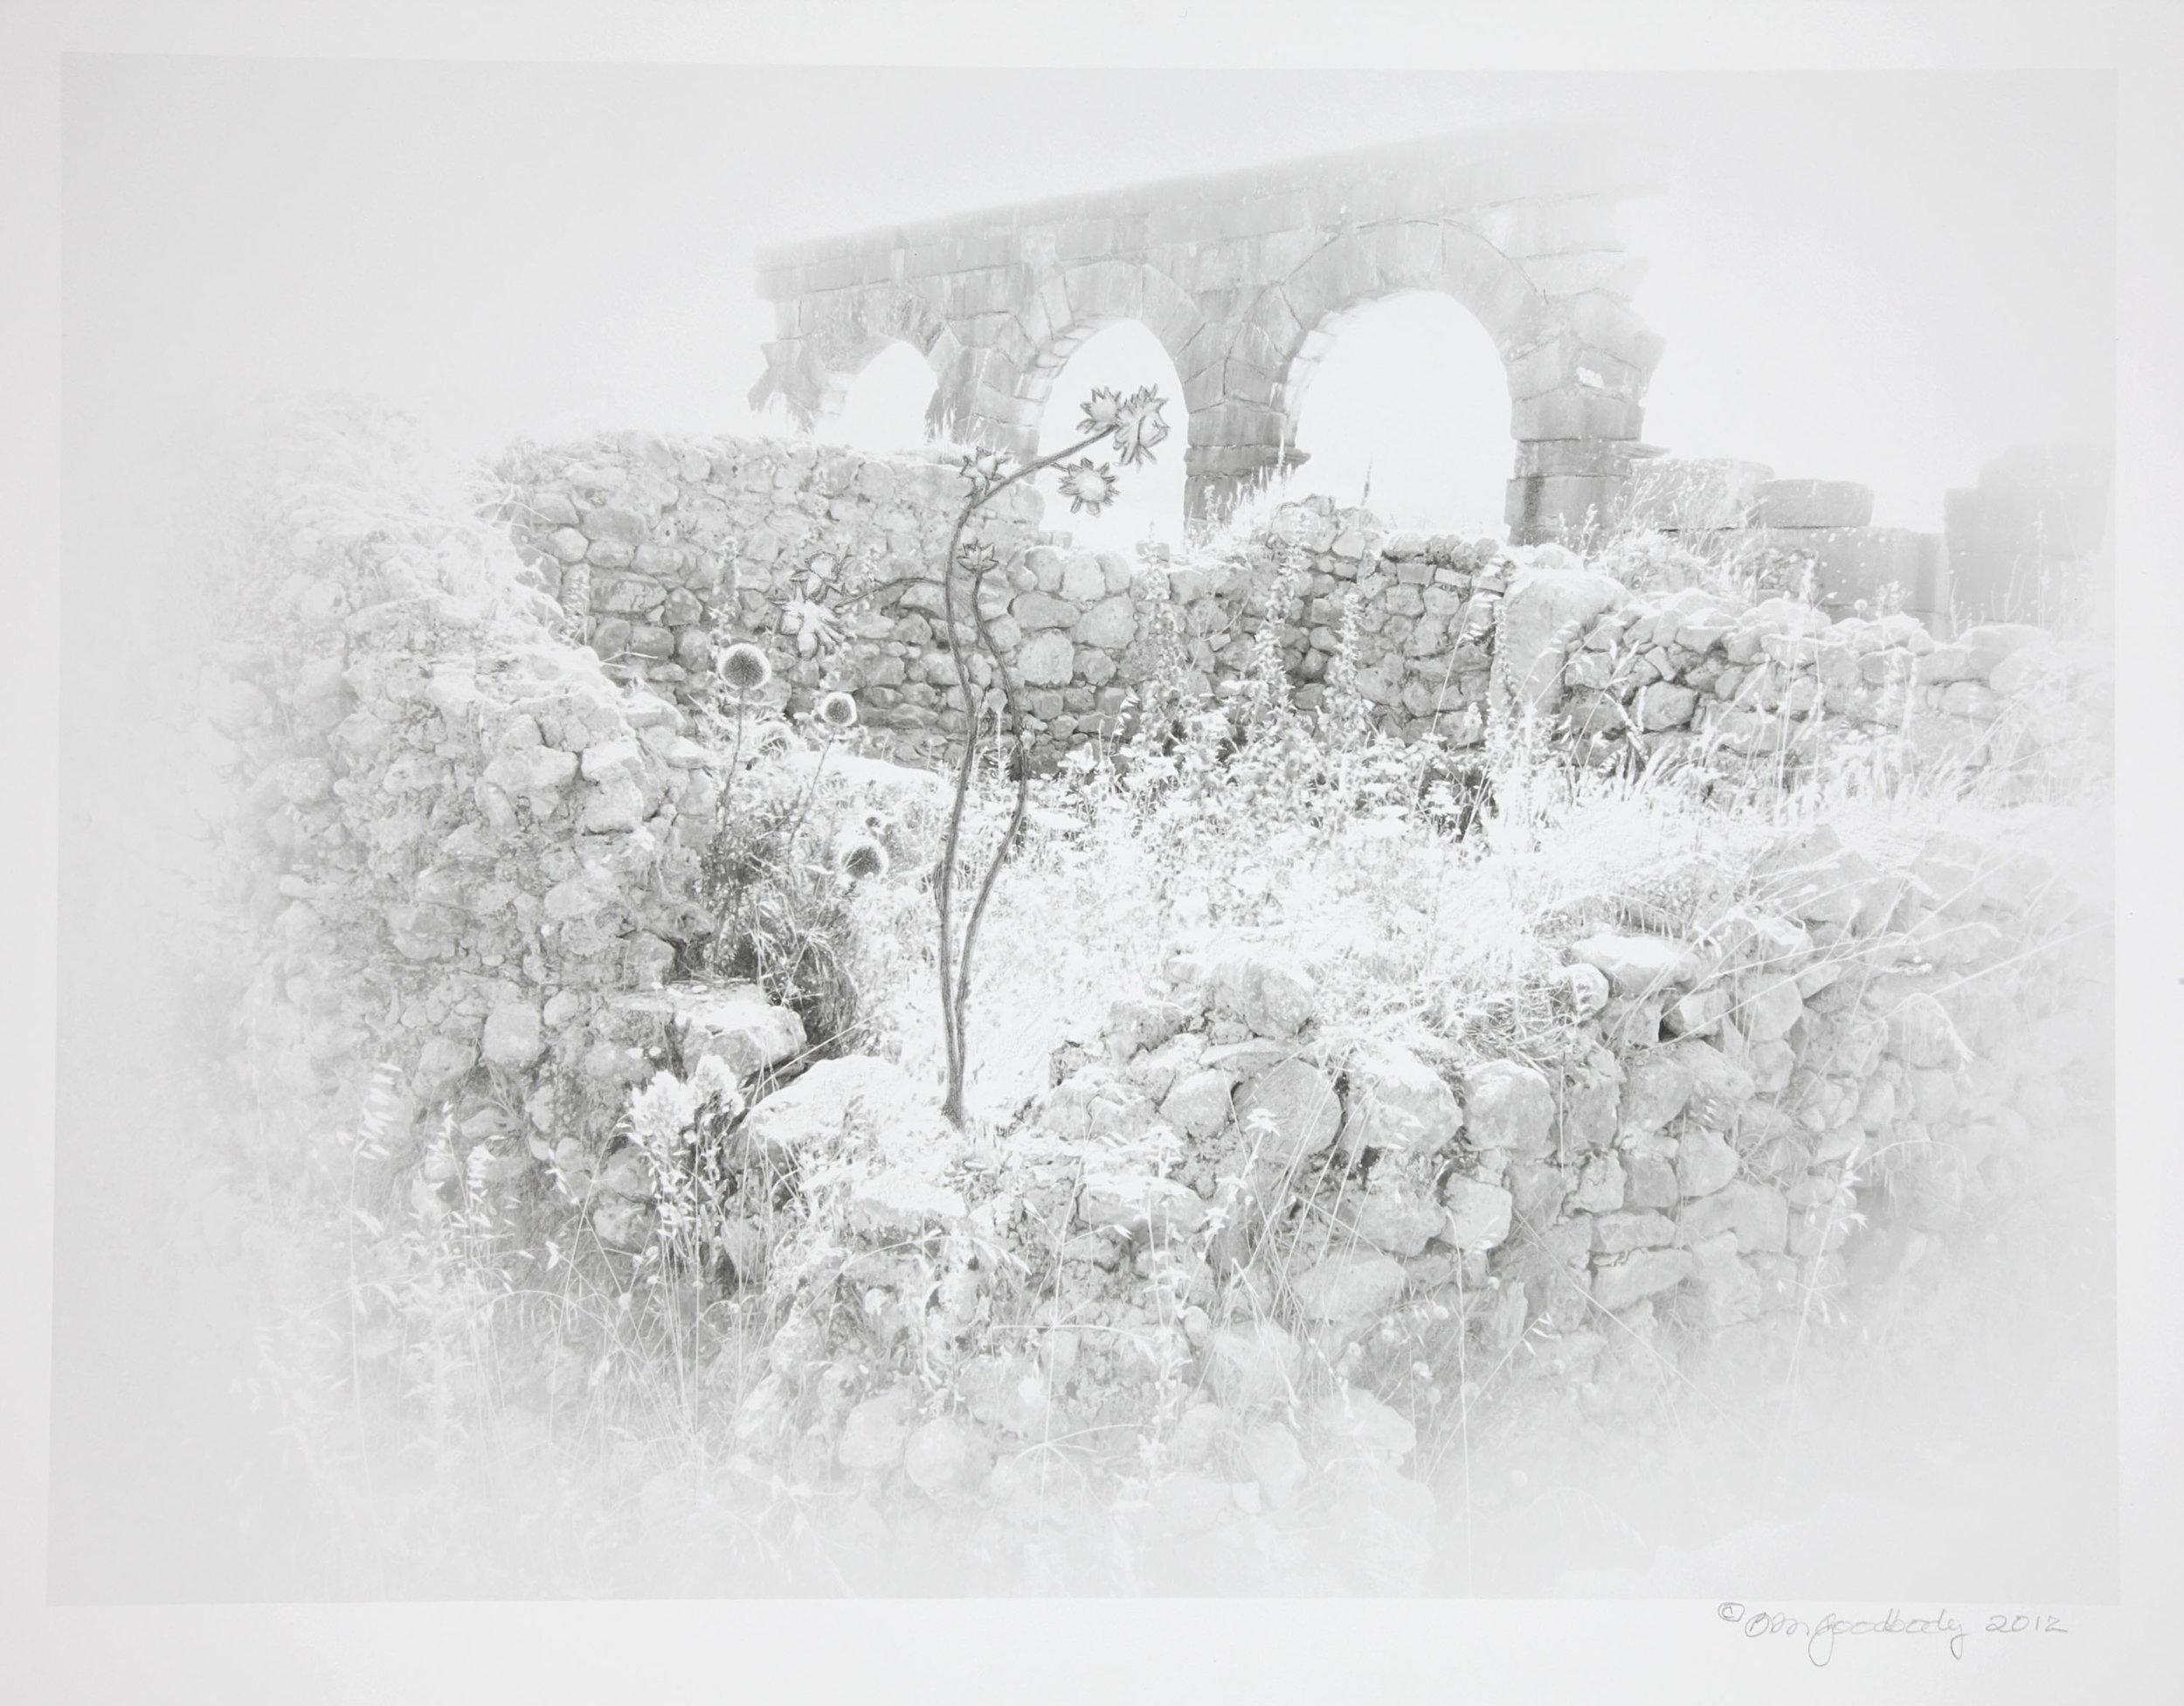 Barbara Goodbody,  Shared Memories  portfolio, 2012, 5/5, Ink jet print, 19.5 x 14 inches